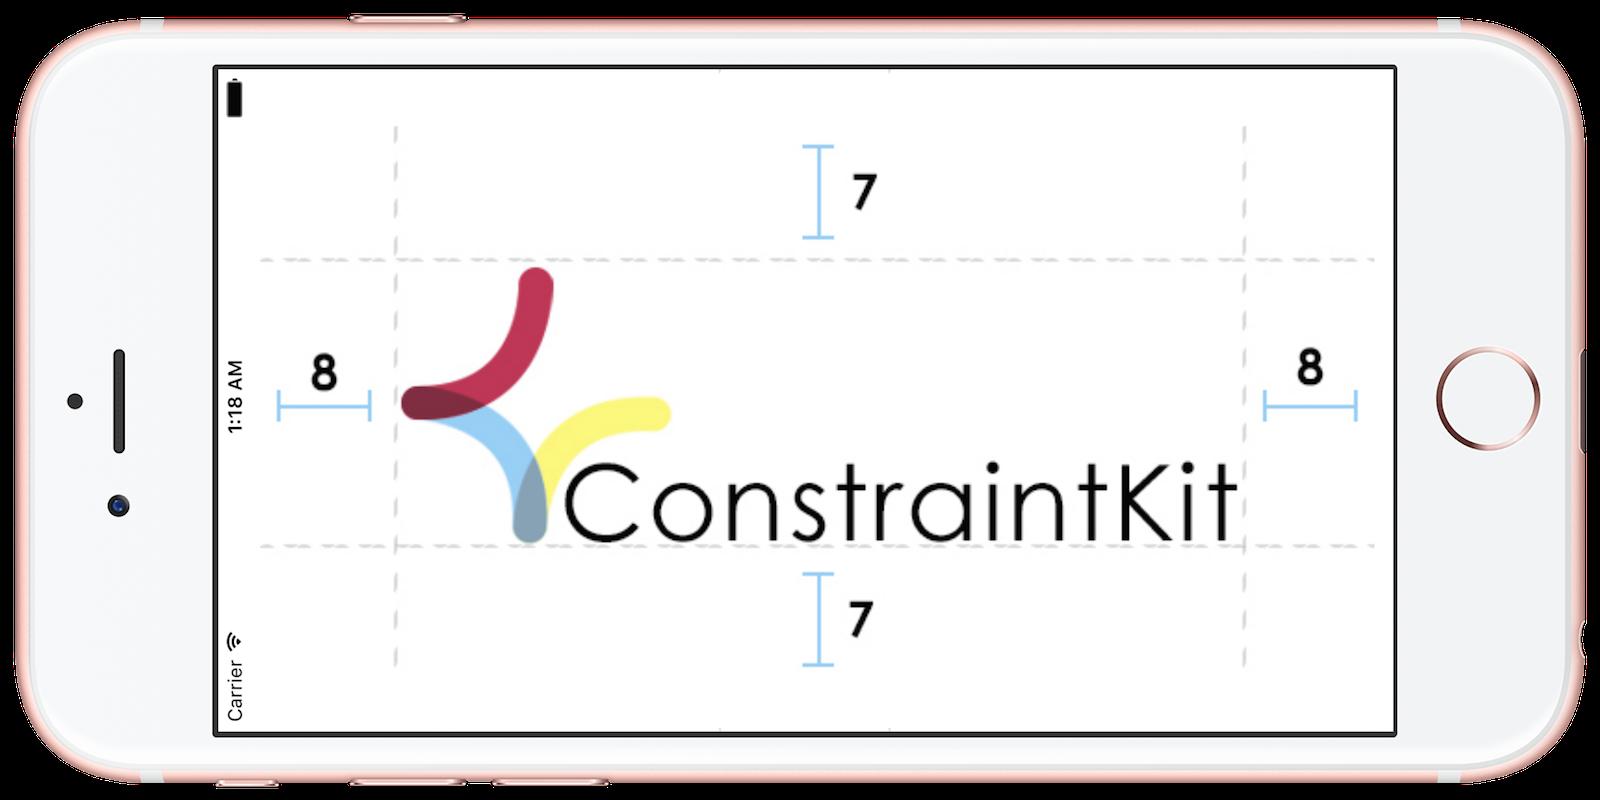 KVConstraintKit